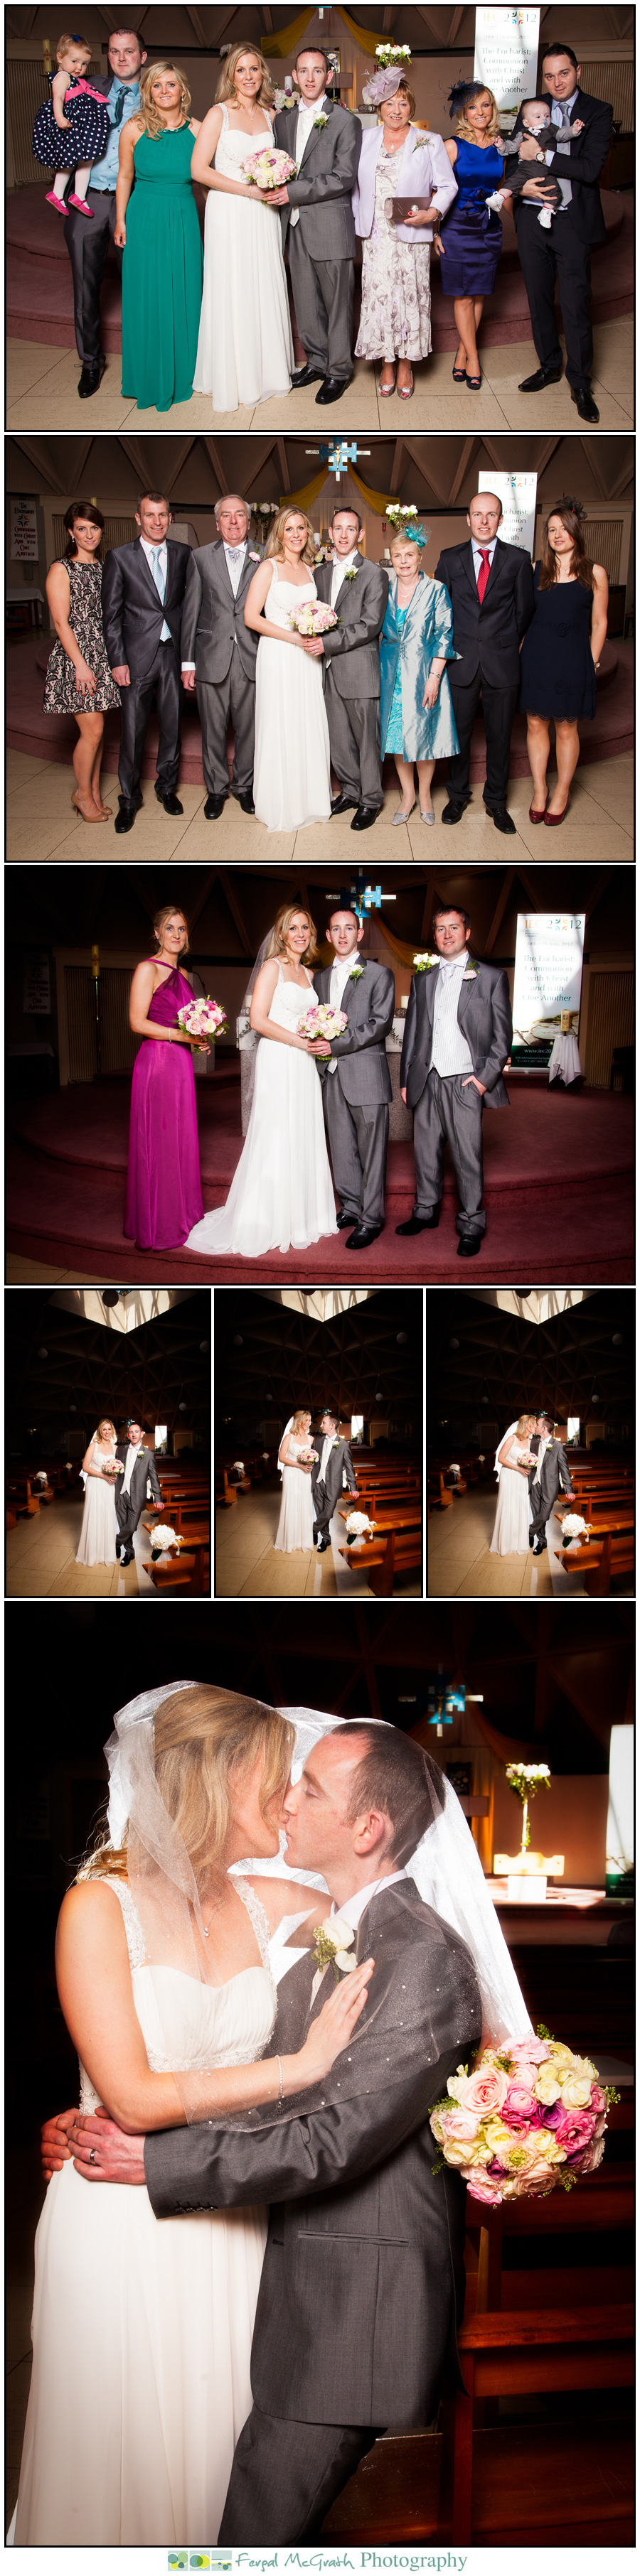 michelle and stephen wedding athlone glasson hotel